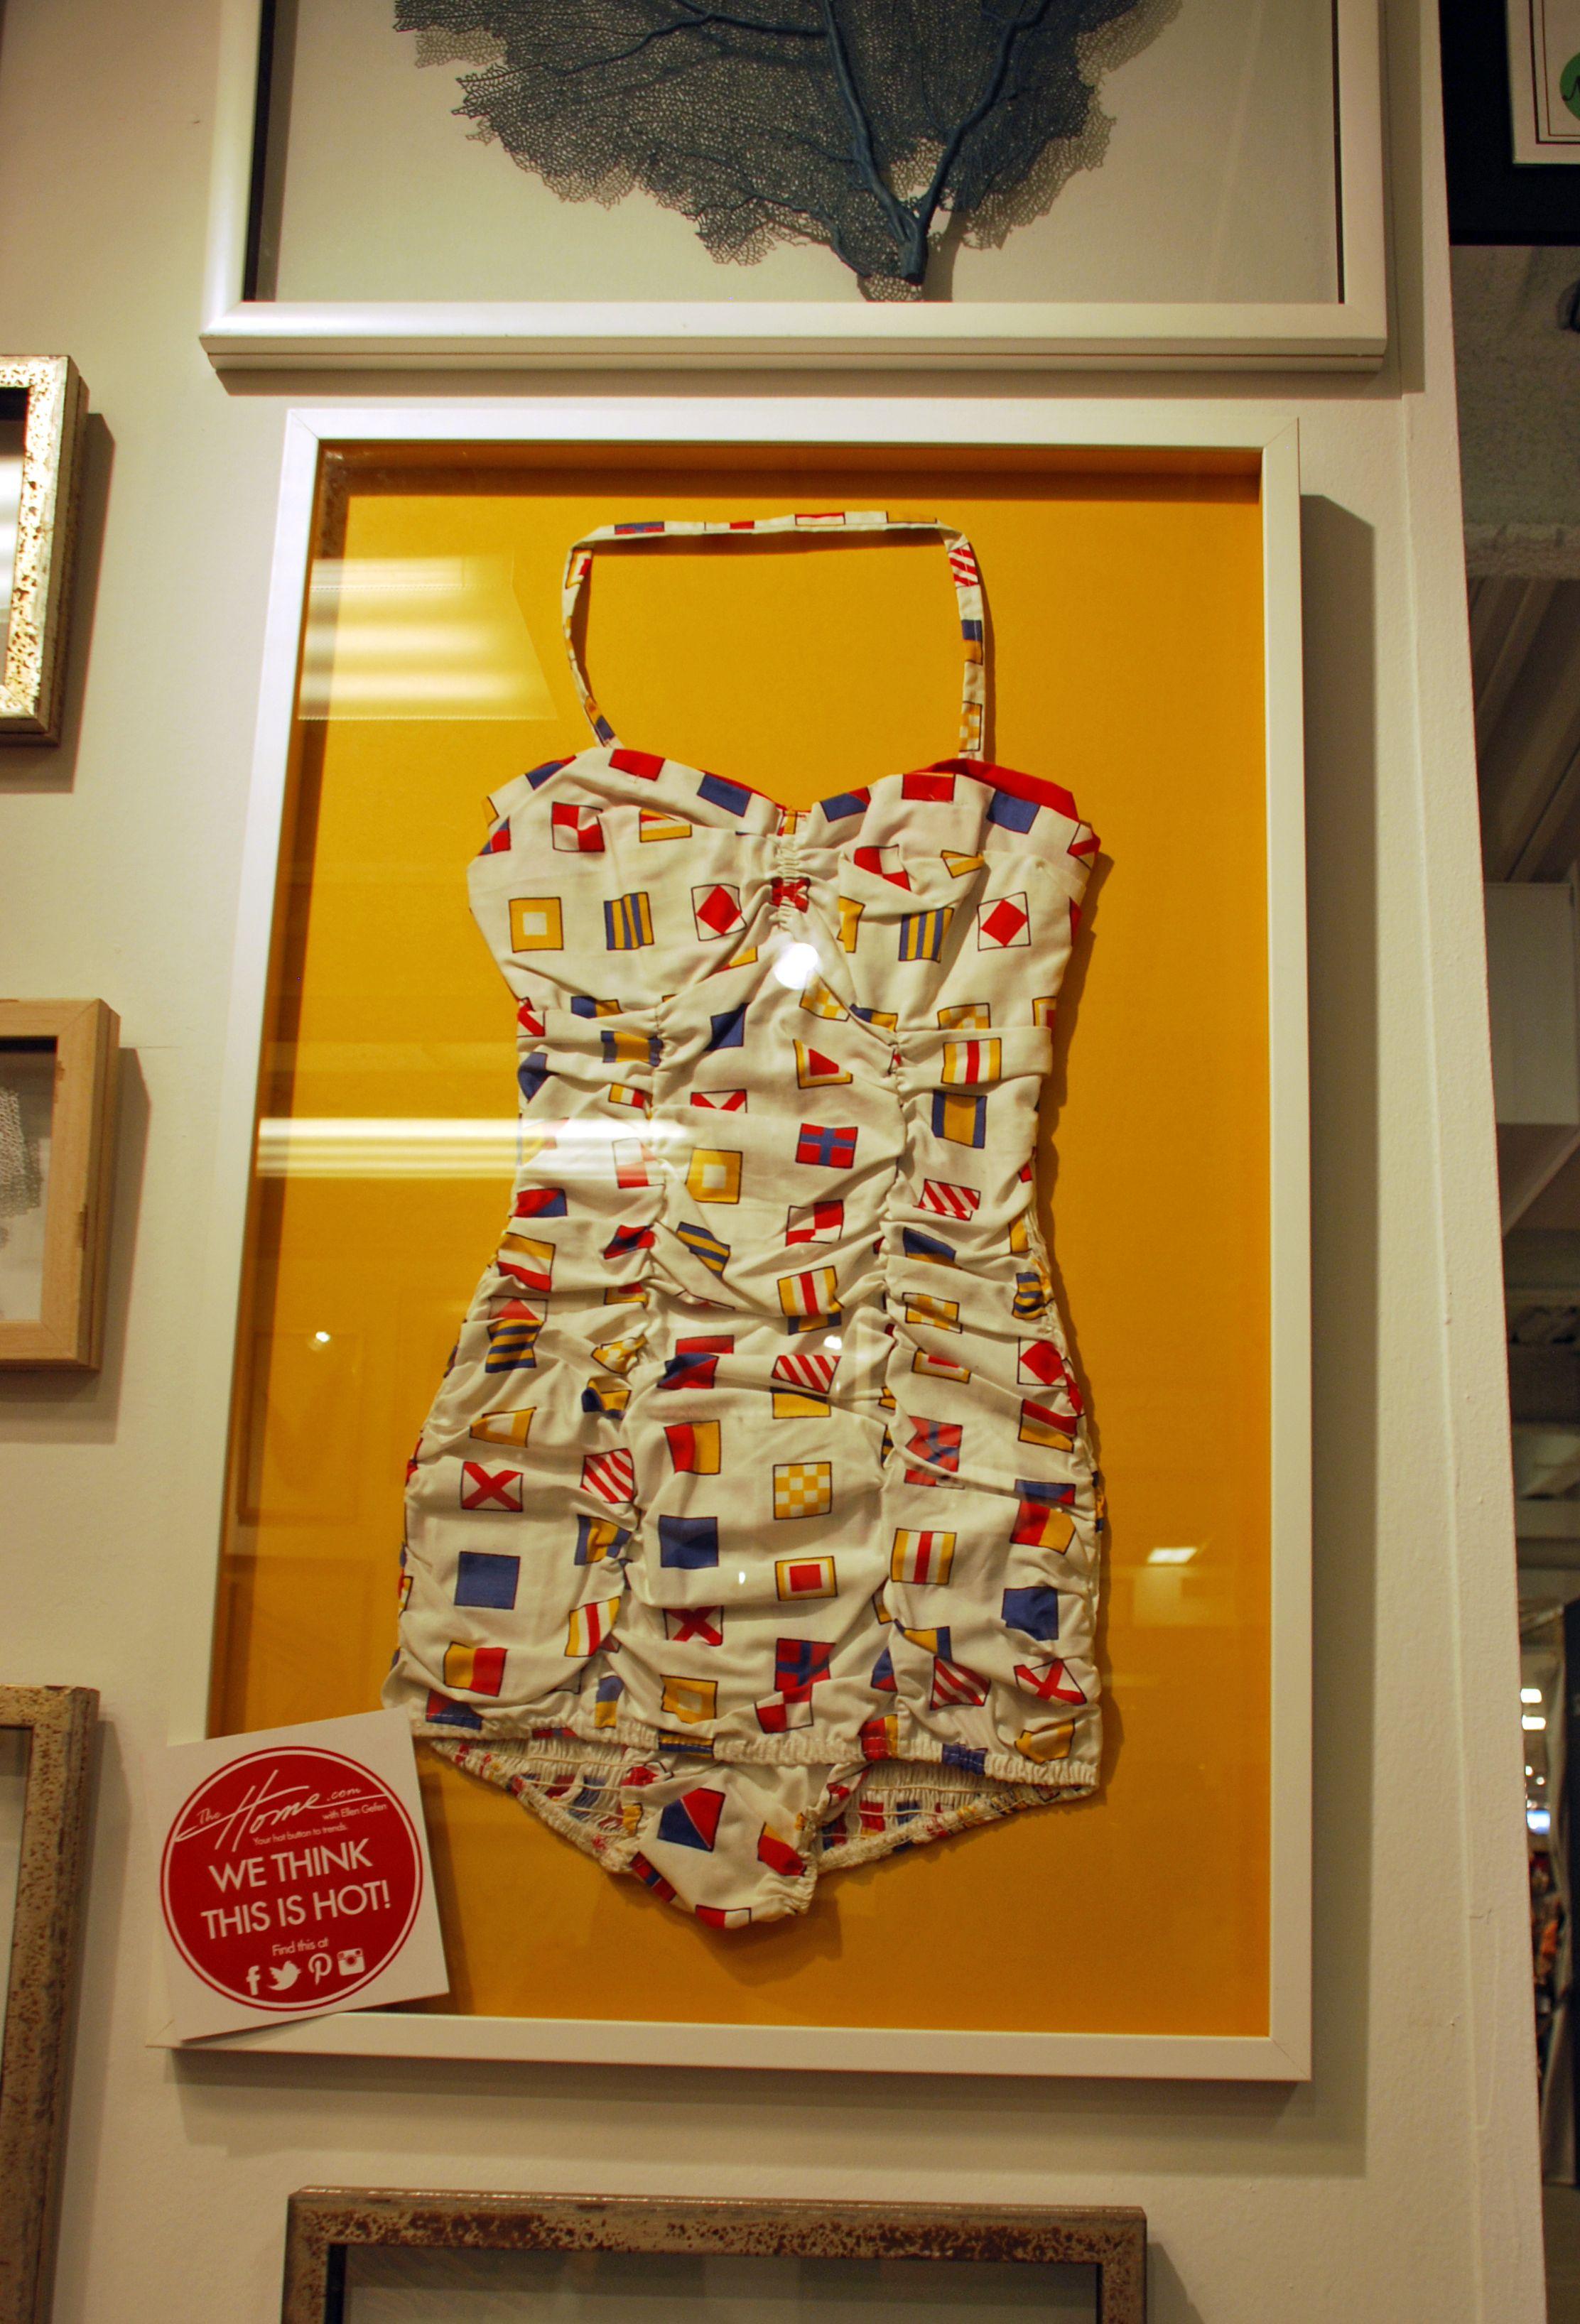 Oceanna Art had a very retro bathing suit as a piece of wall art ...